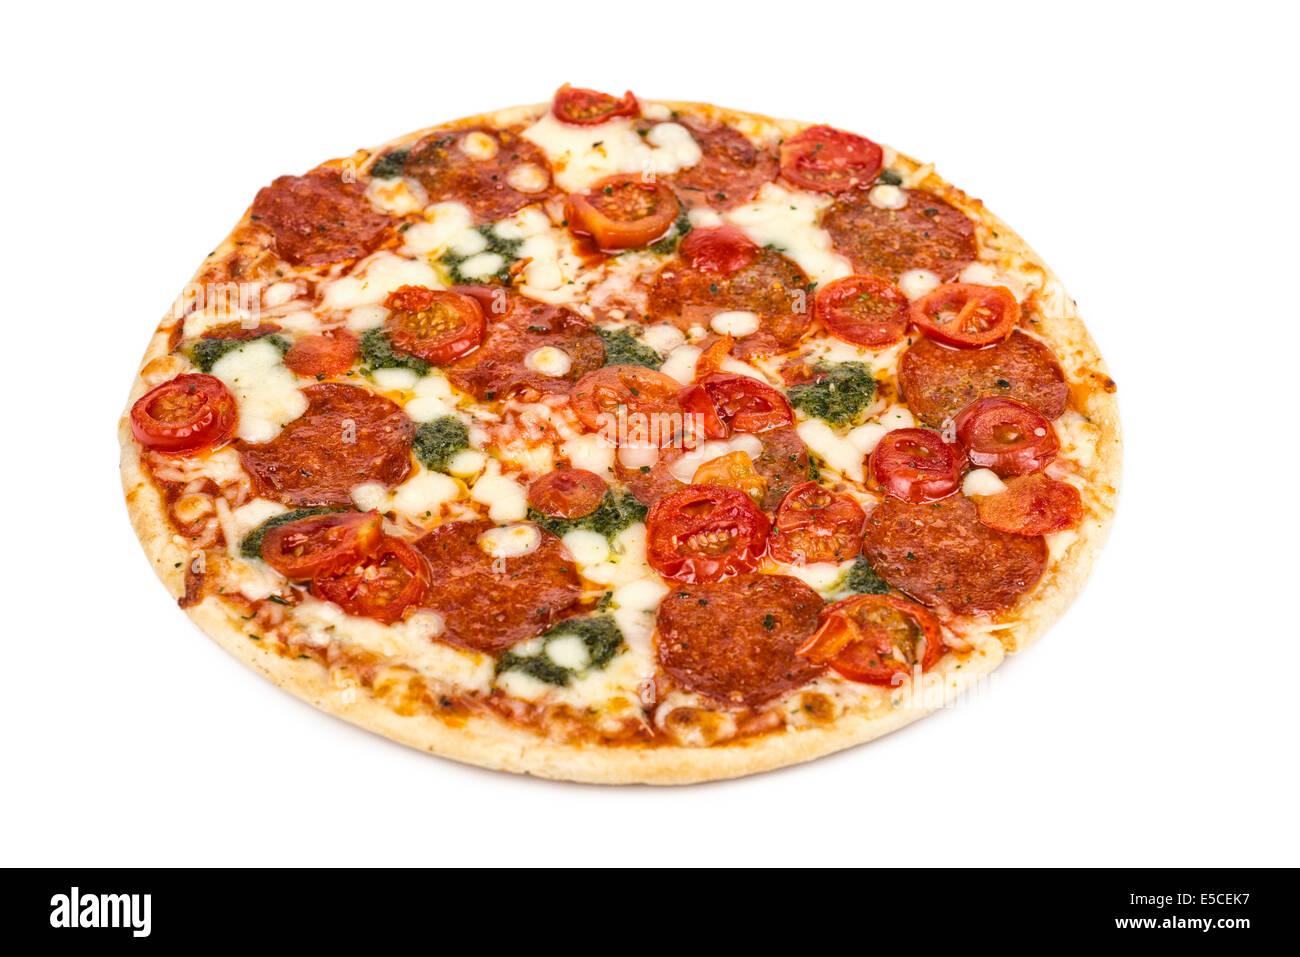 Pizza de pepperoni Imagen De Stock